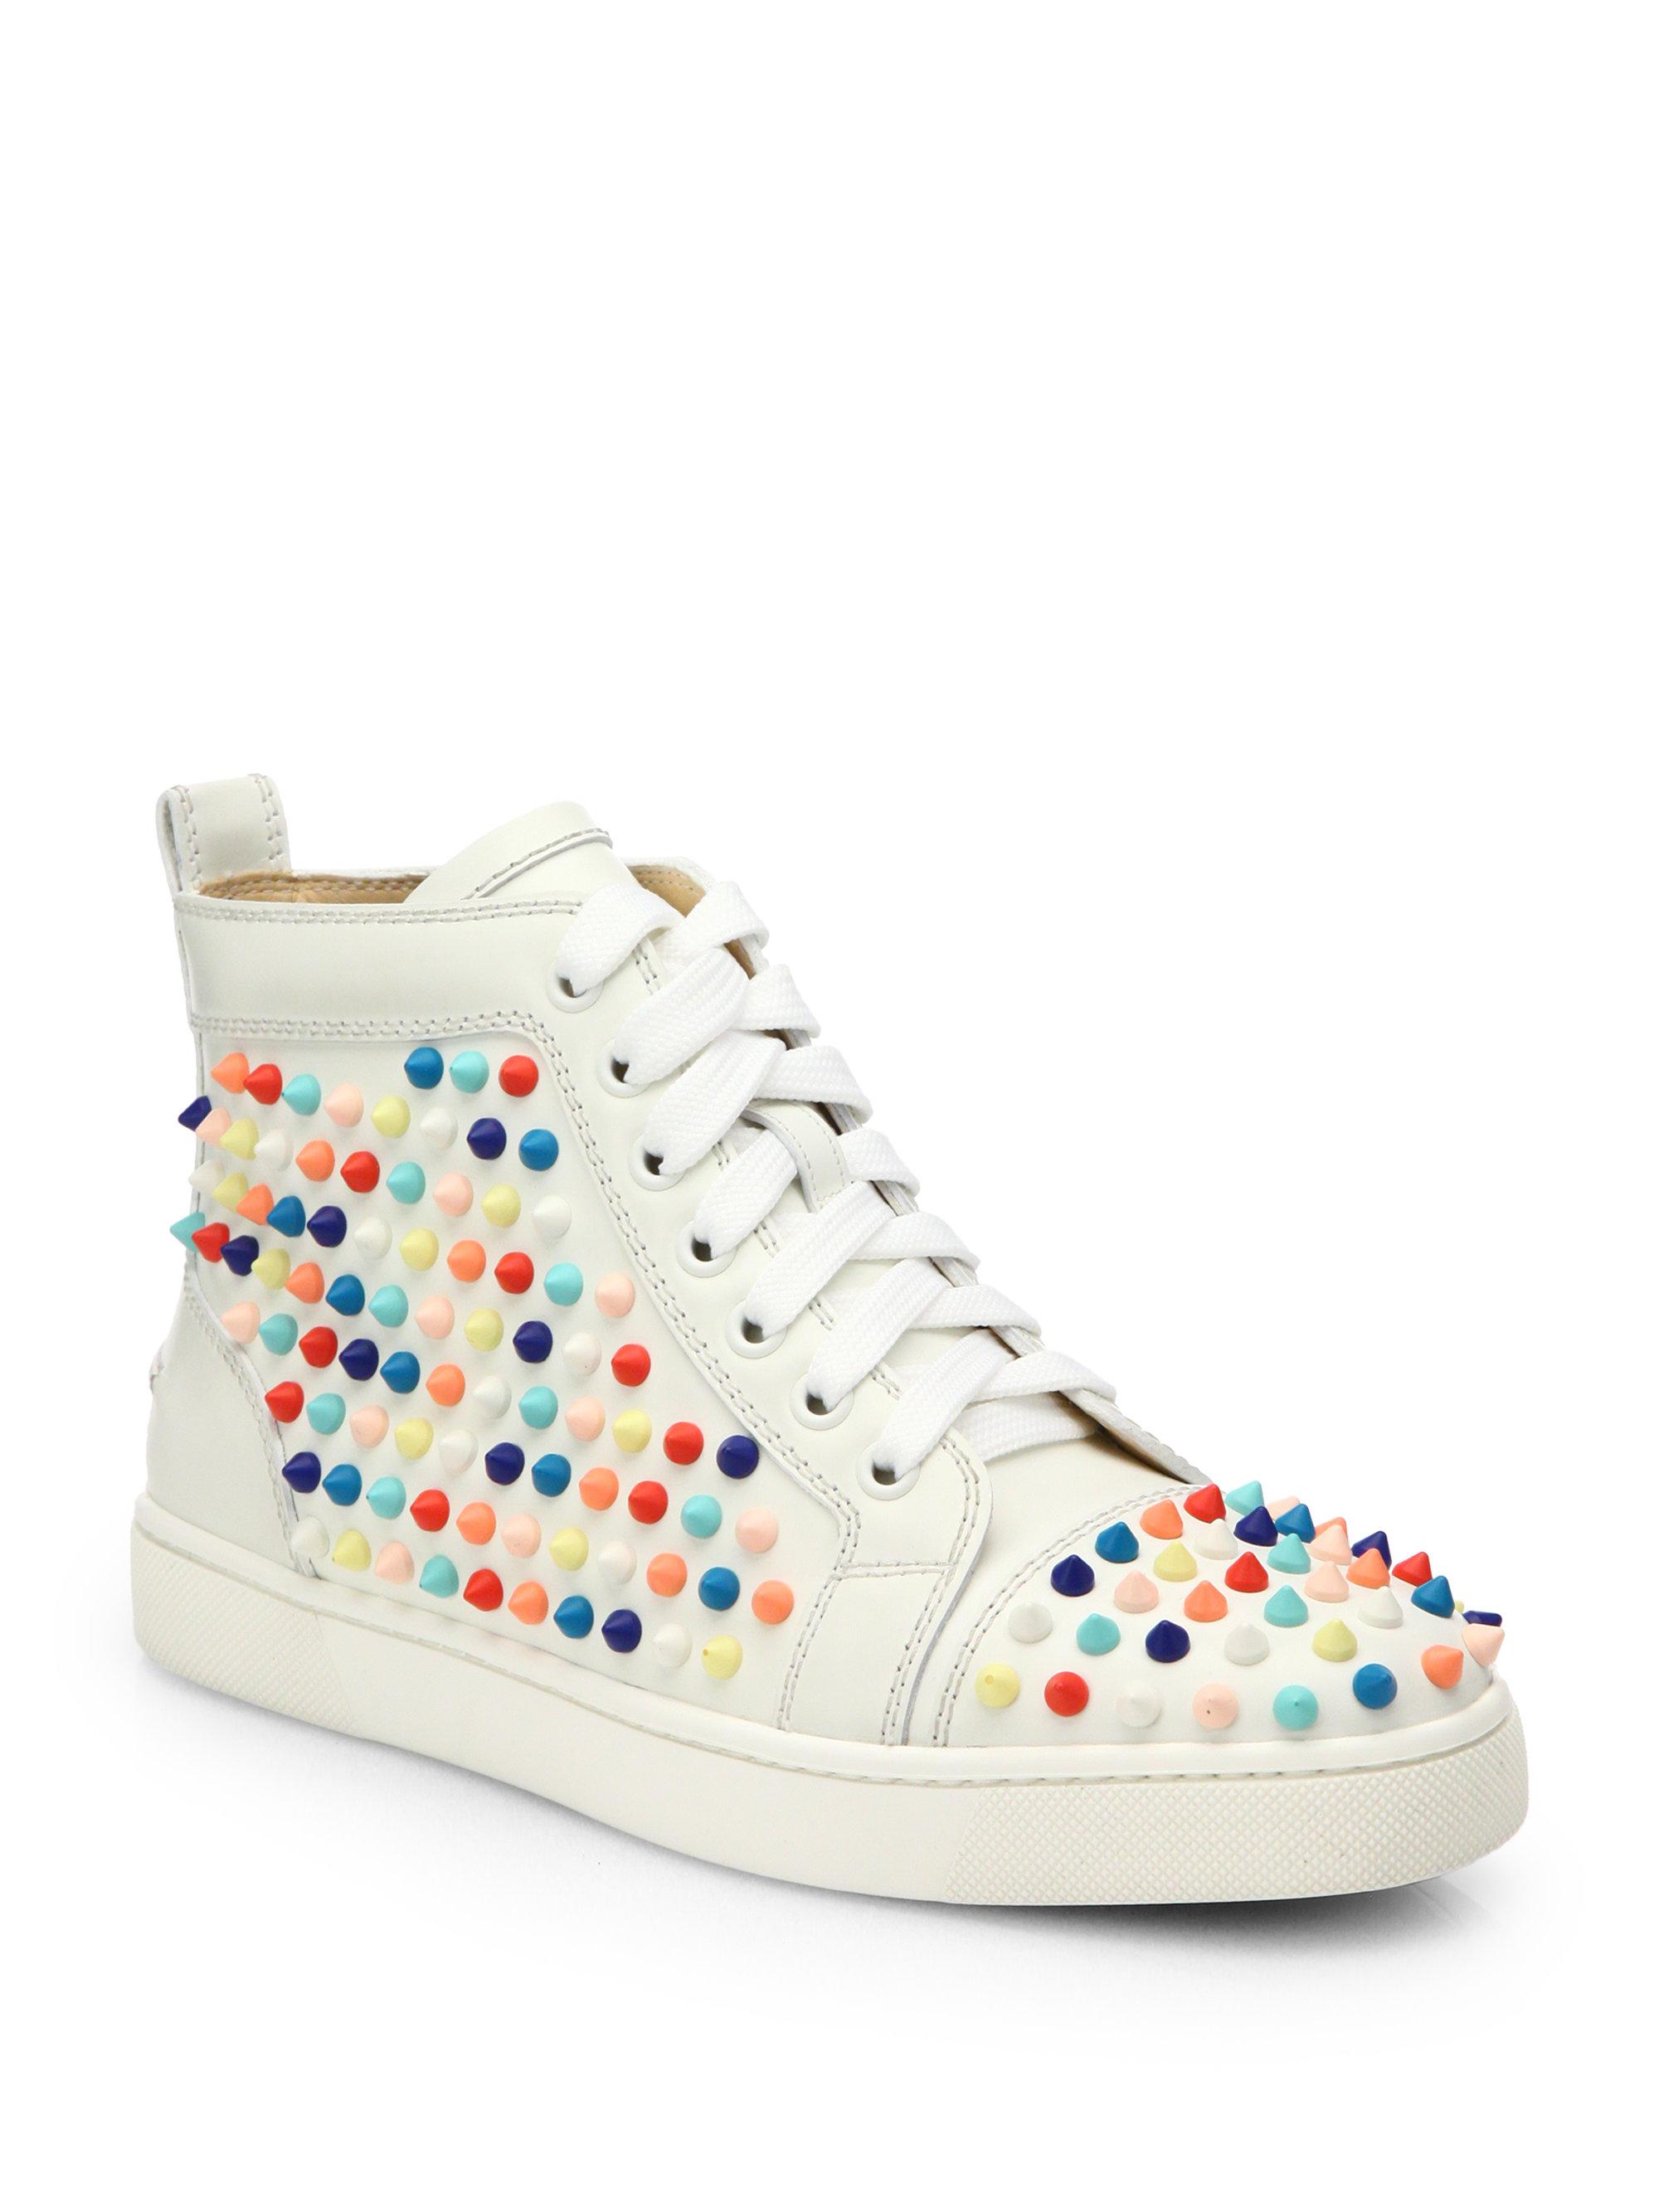 04eb46e442ea0 ... Lyst - Christian Louboutin Louis Woman Studded Leather Wedge Christian  Louboutin Sneakers Colorful ...